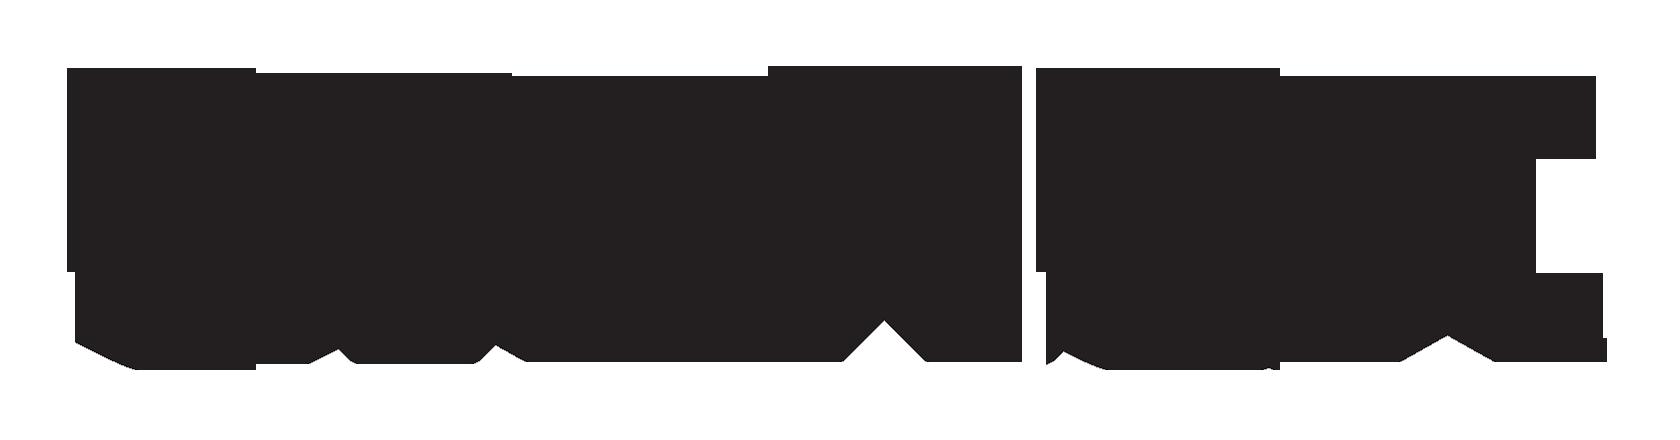 Dizajnové zbernicové vypínače ekinex na INTELIDOM.sk